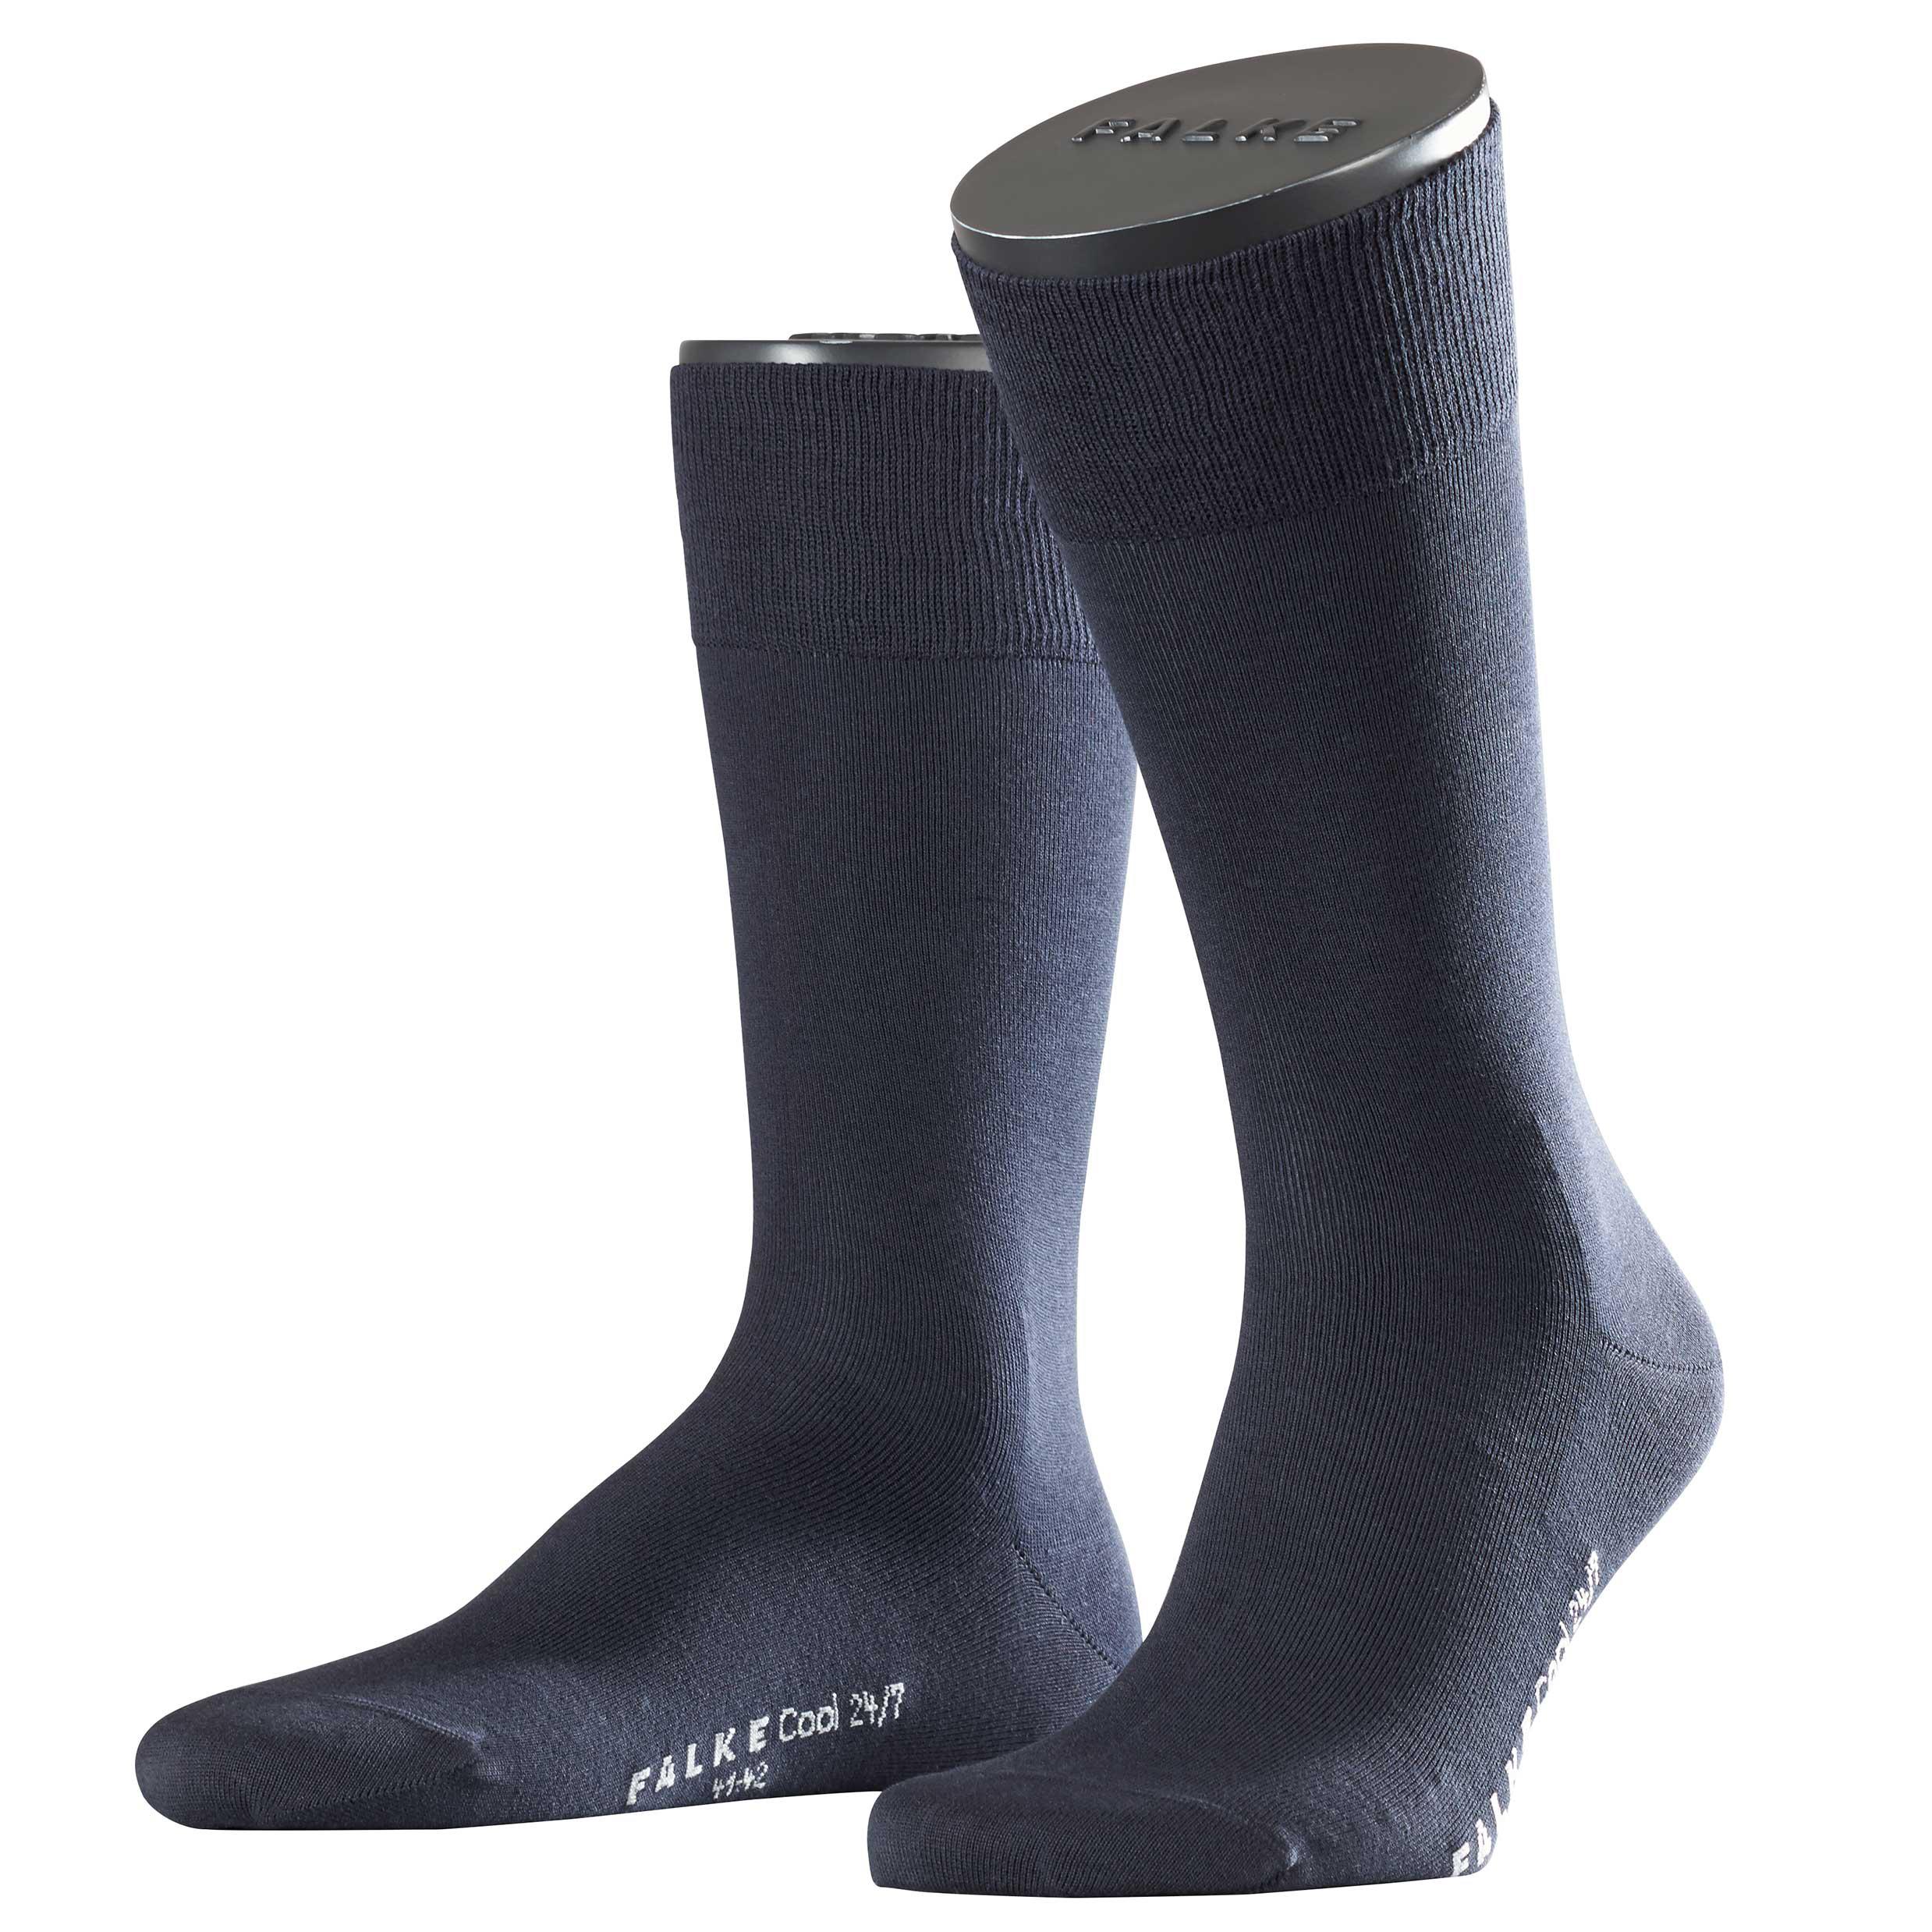 Falke Buisness Socke marine blau 13230 6370 Basic Cool 24/7 Baumwolle